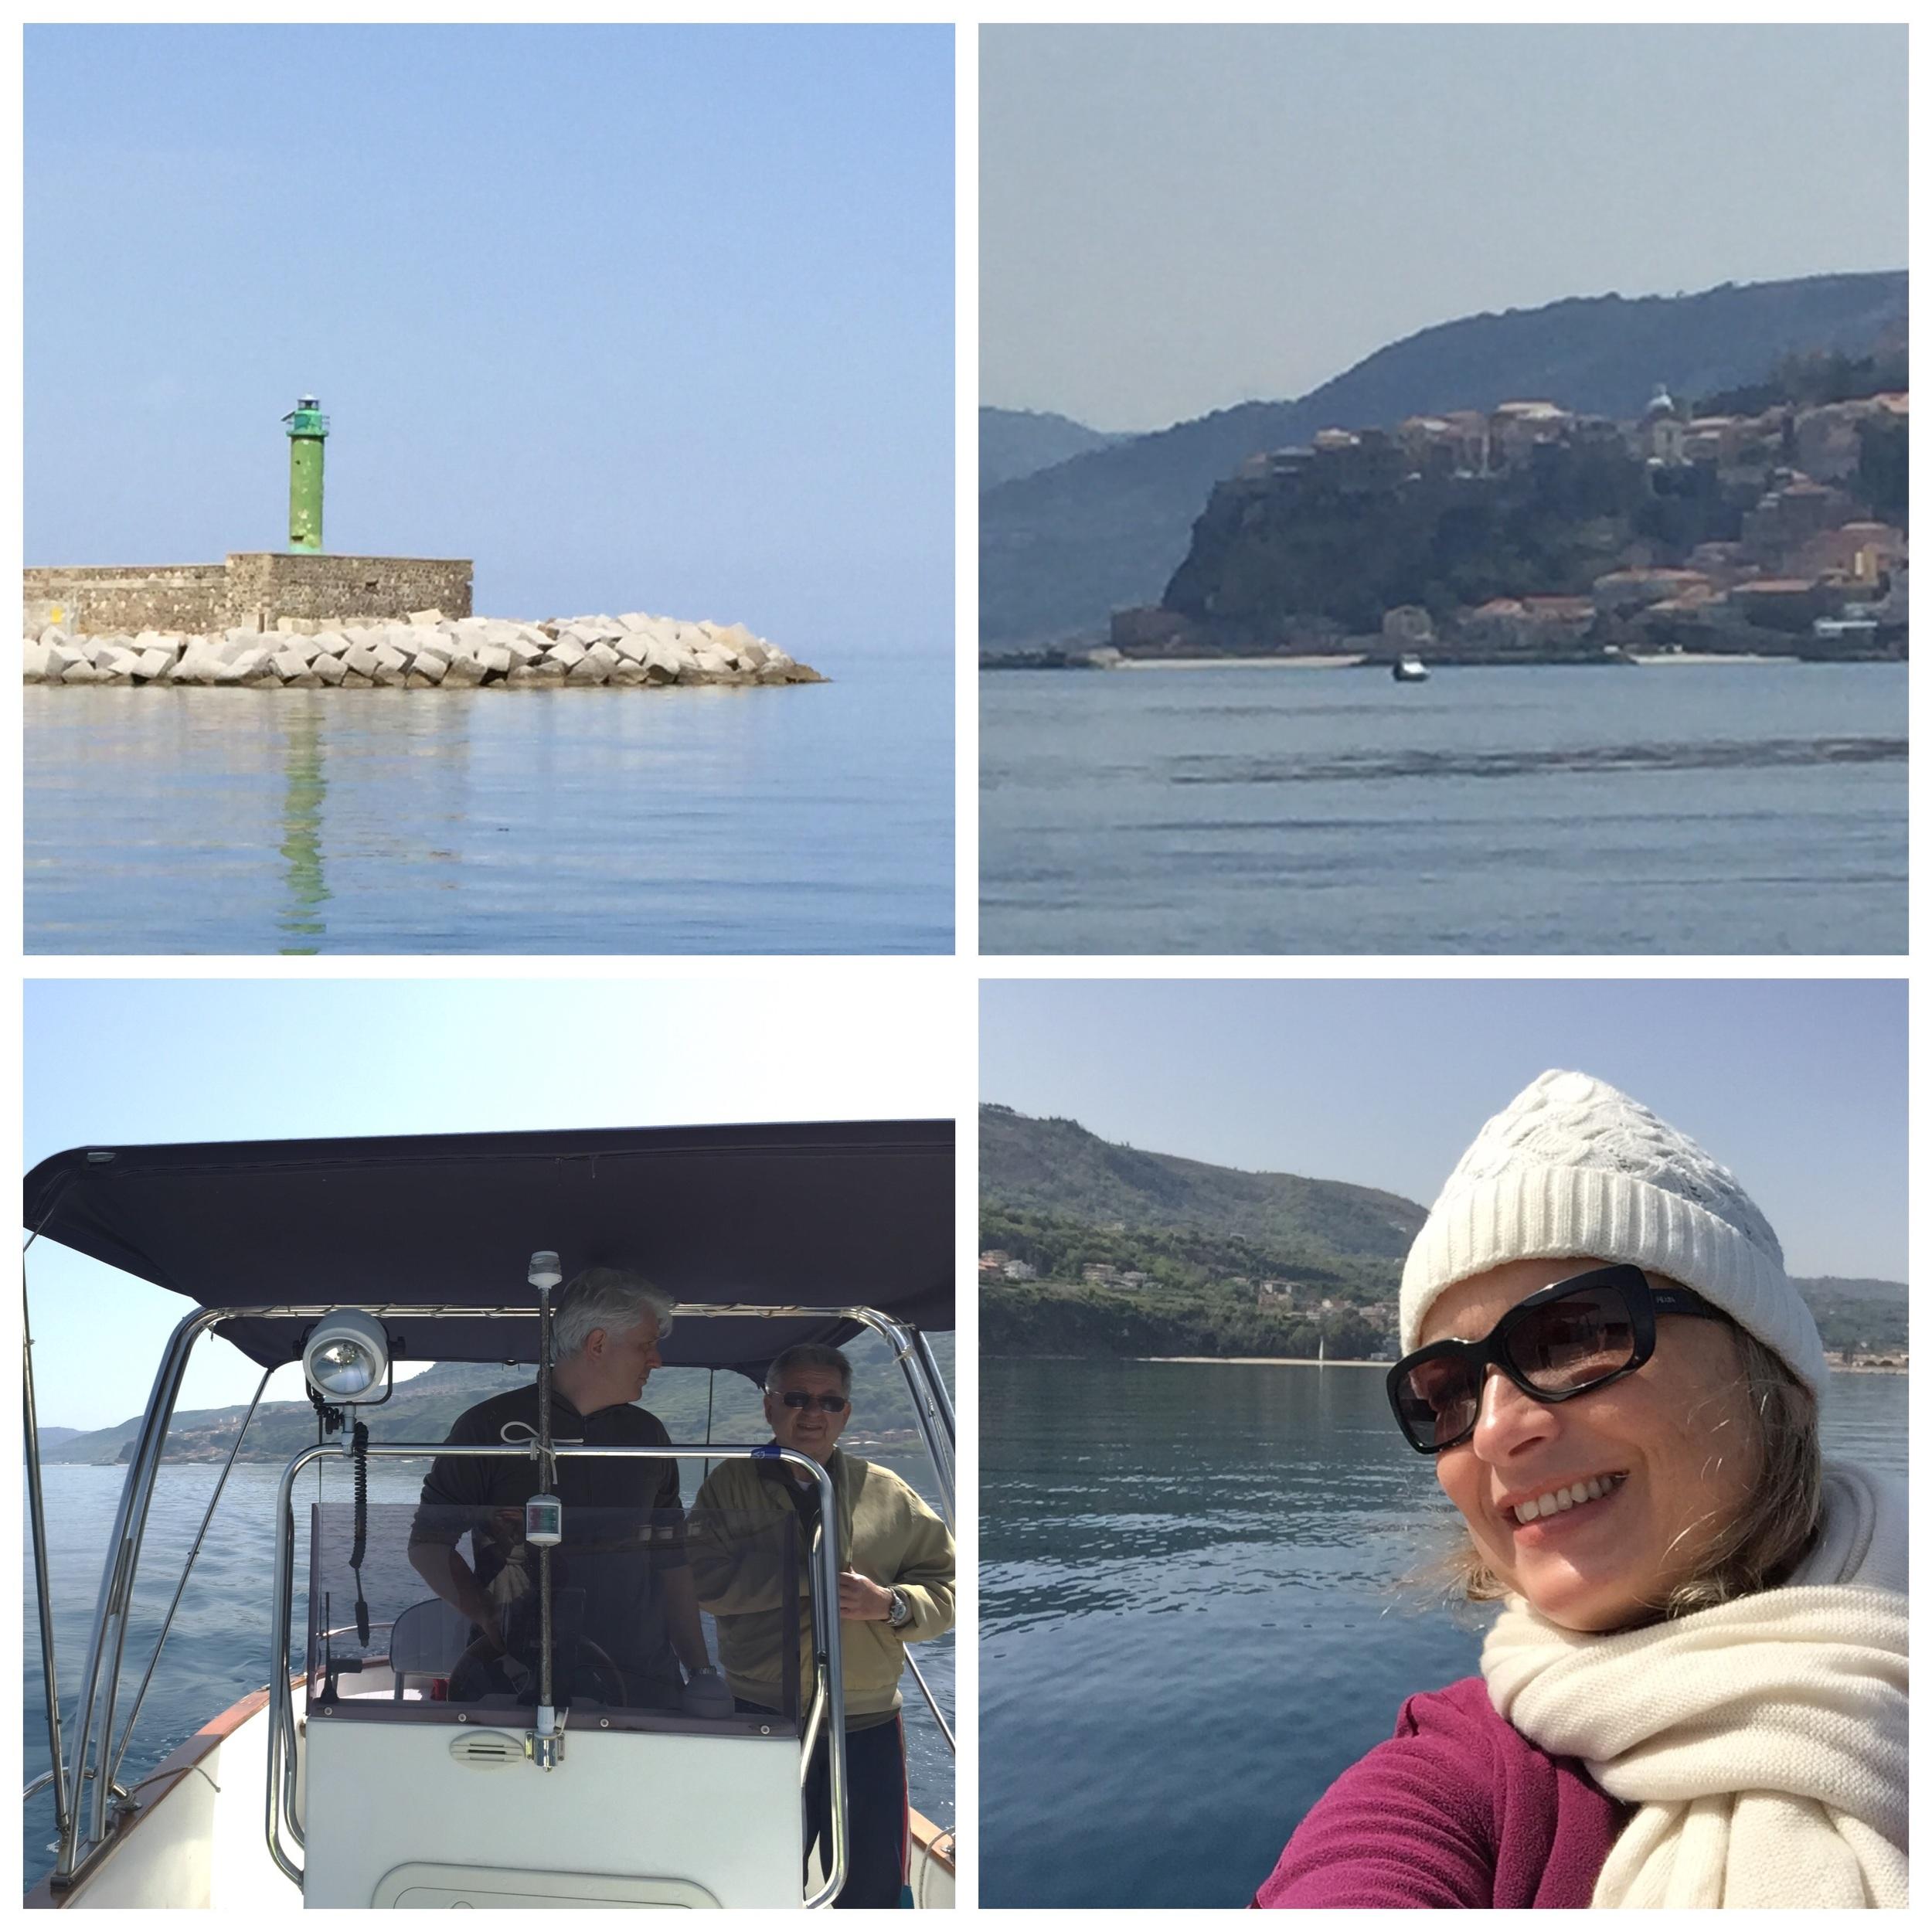 Boat trip April 2015